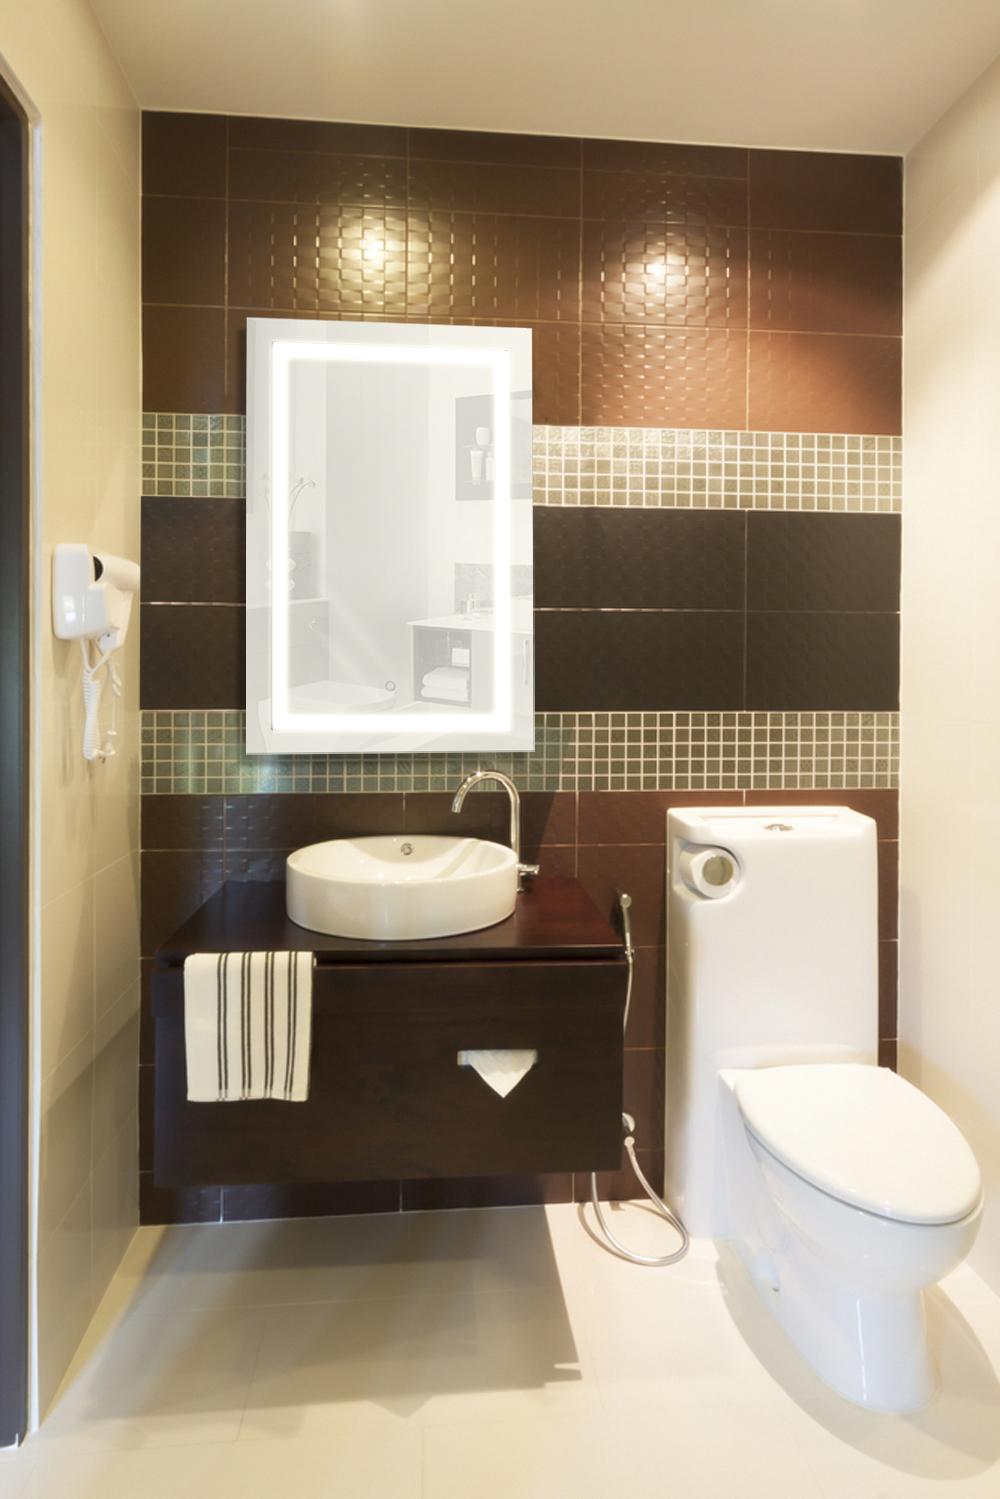 LED Bathroom Mirror 24 X 36 Wall Mount Vertical Or Horizontal Lighted Vanit